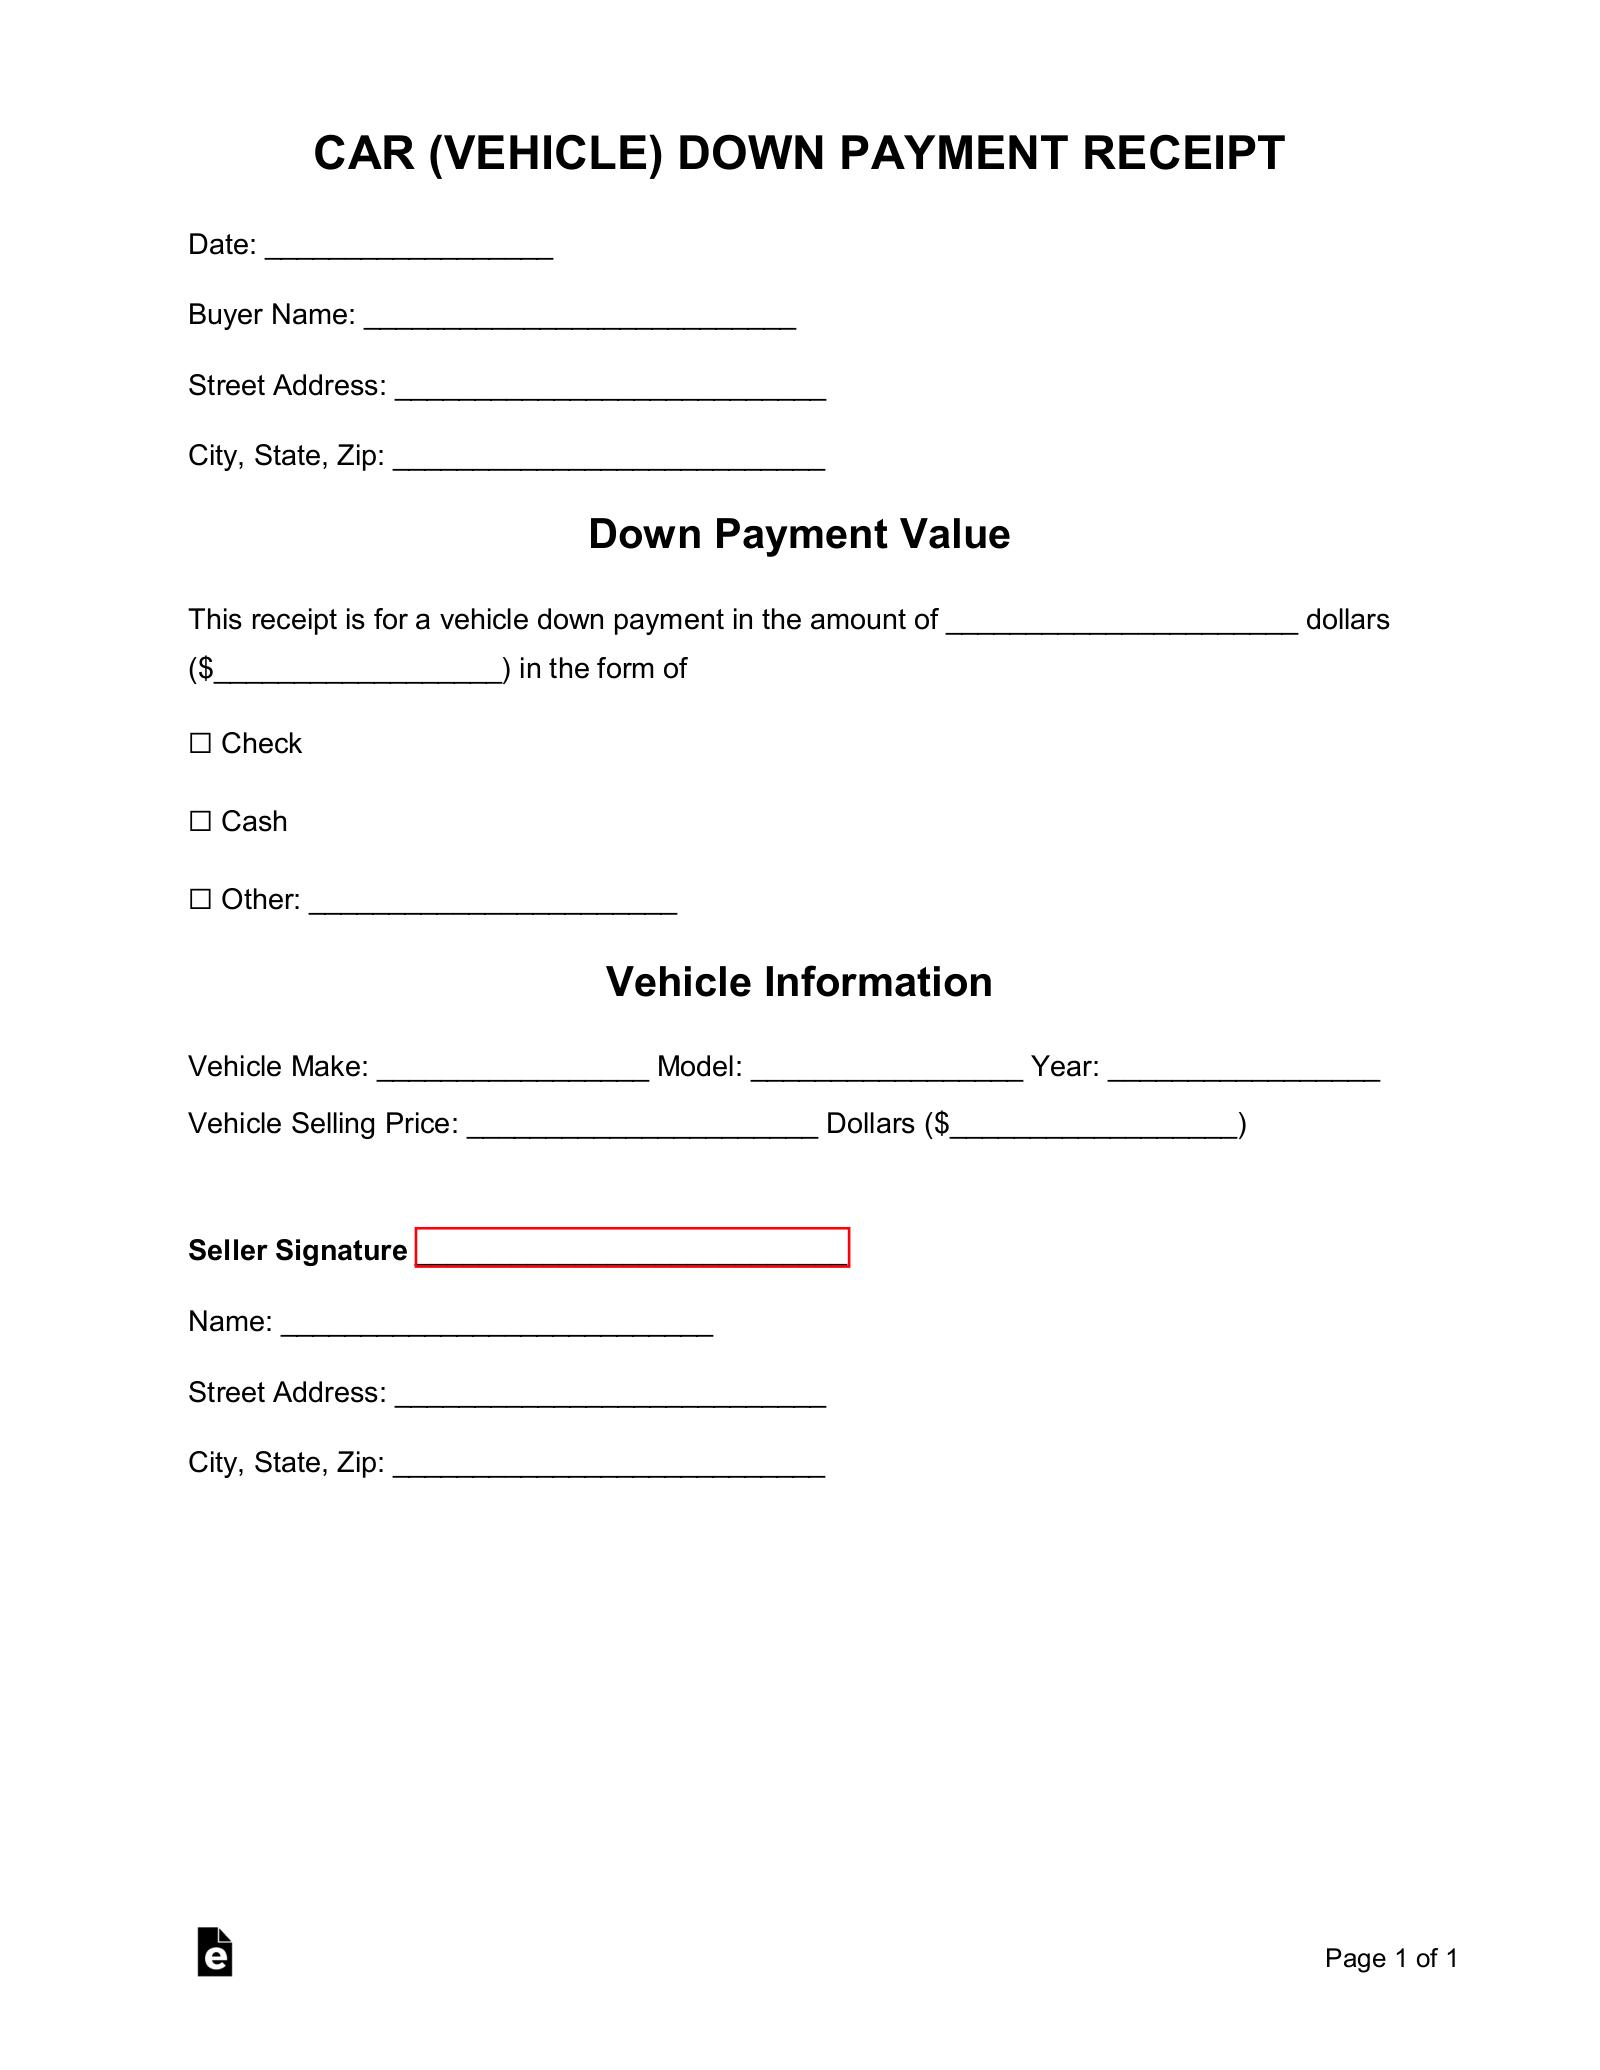 Free Car (Vehicle) Downpayment Receipt